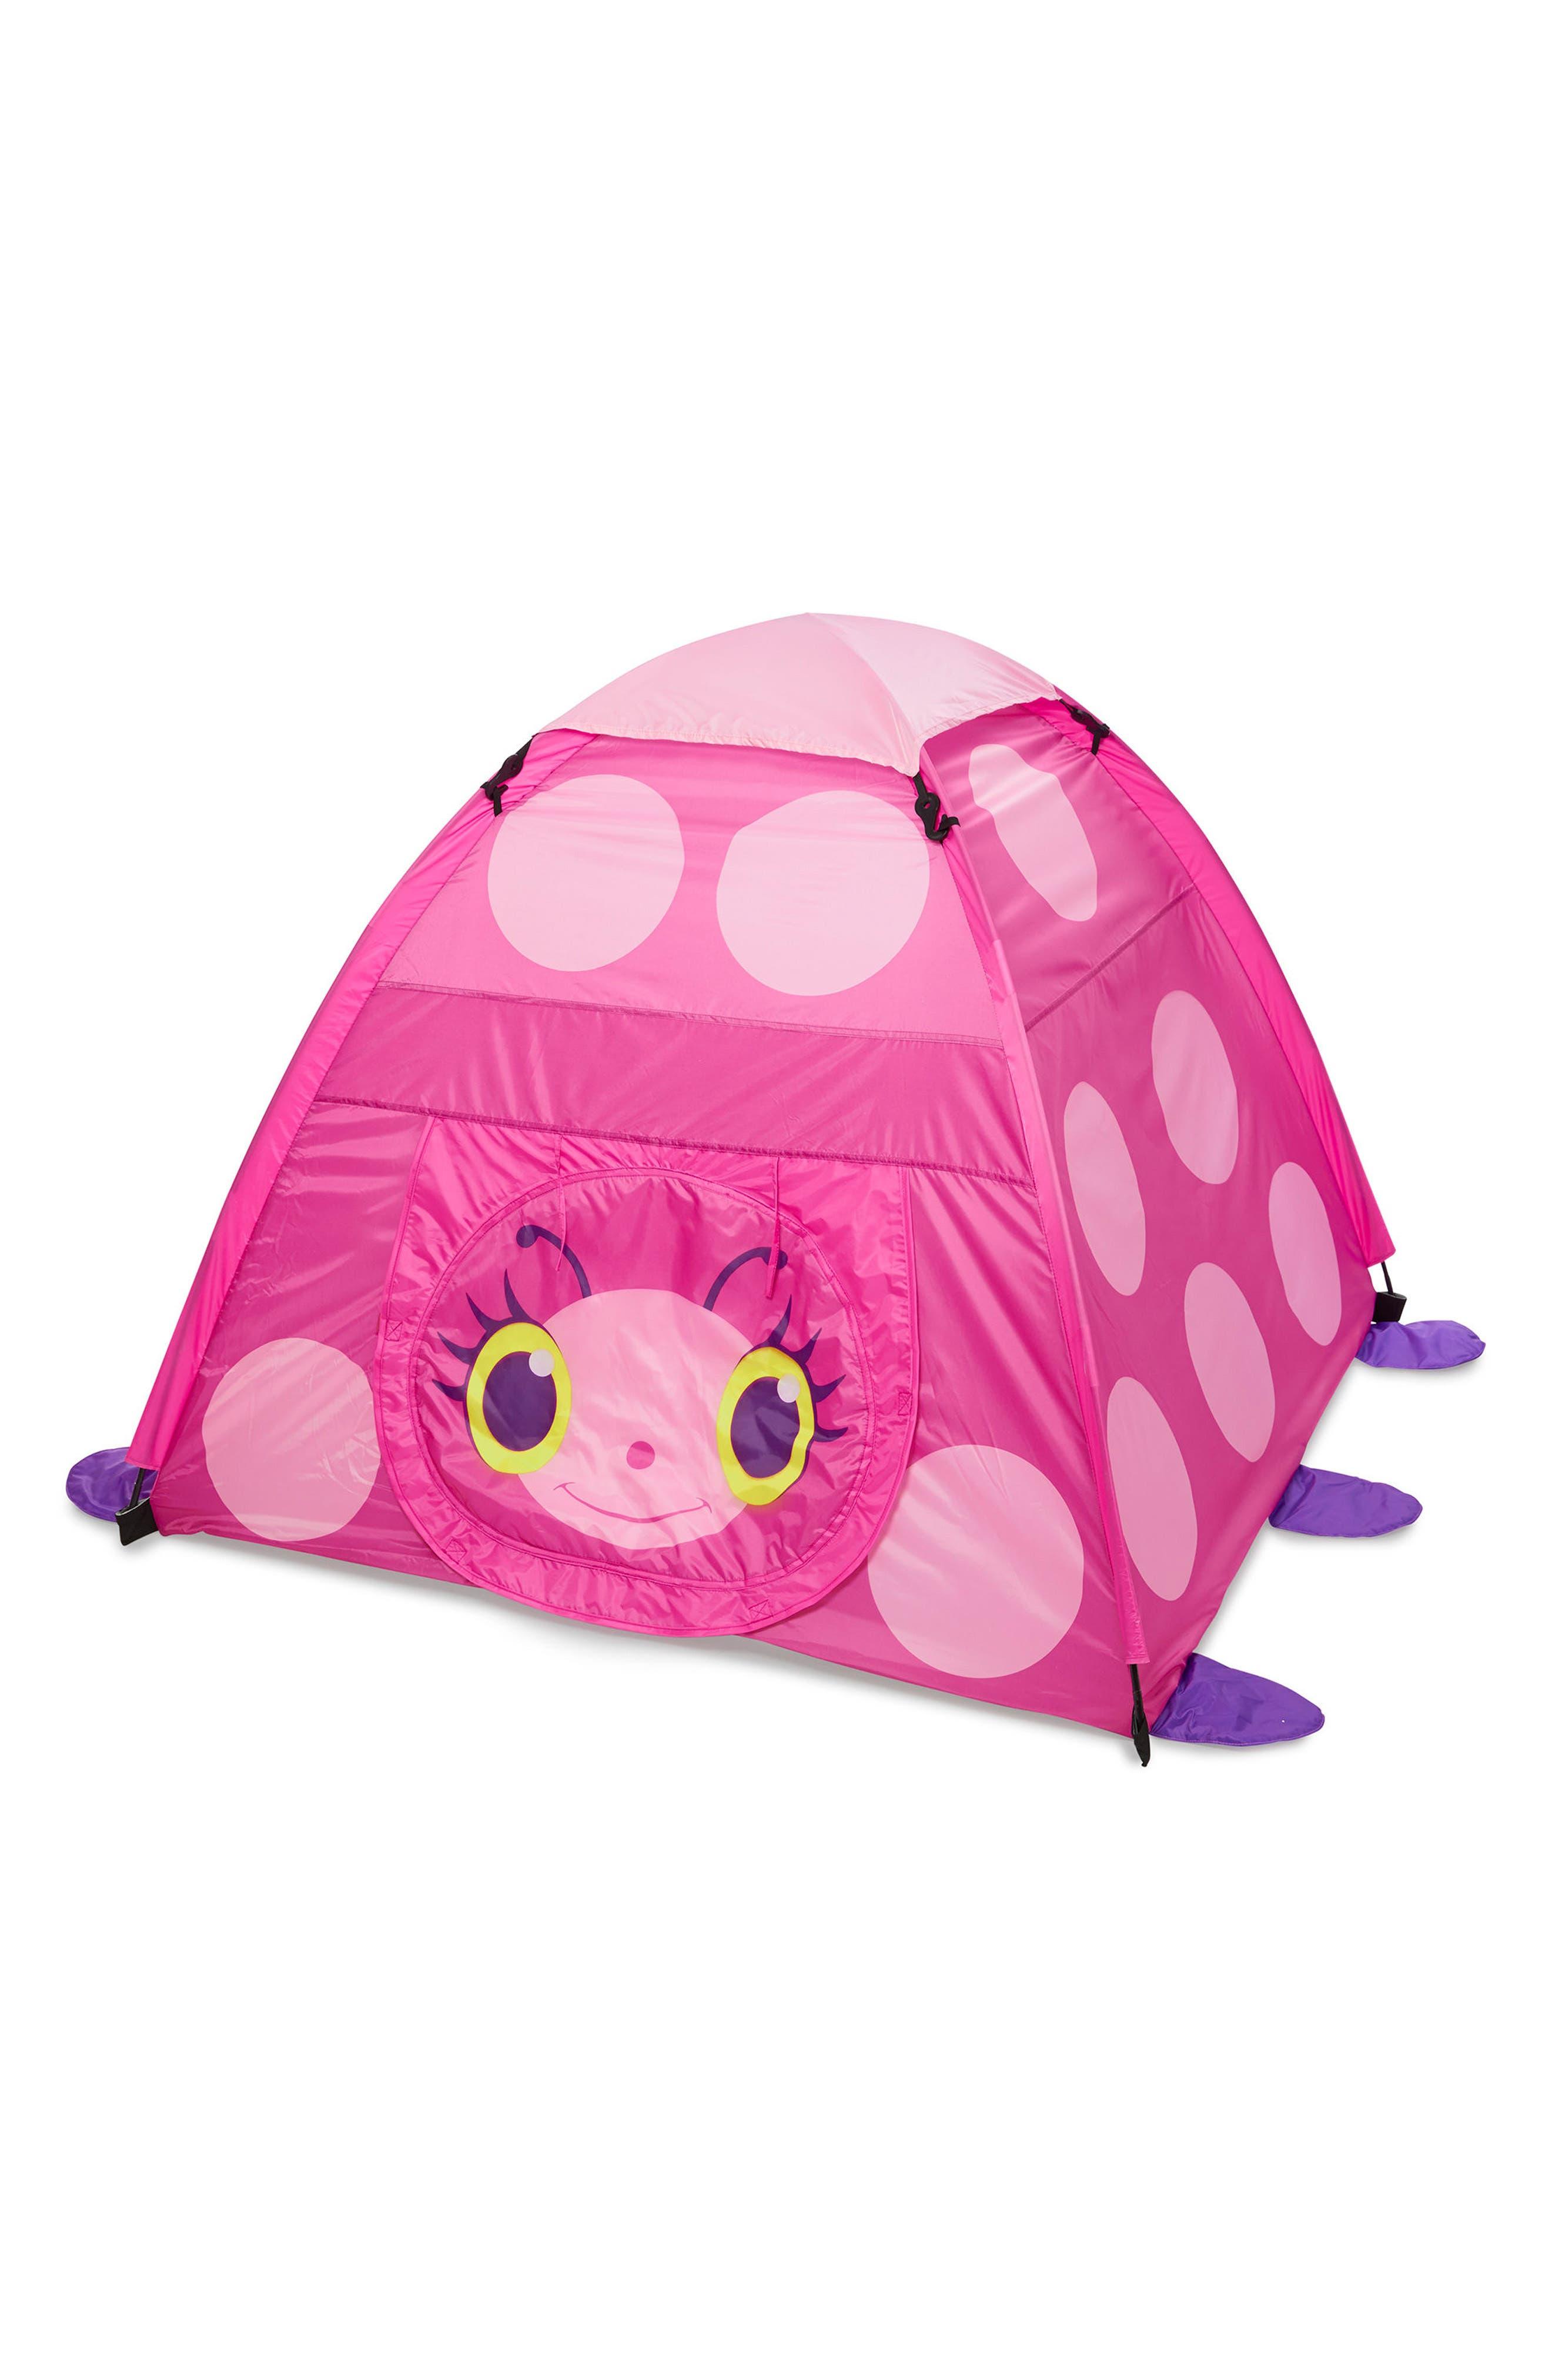 Trixie Ladybug Tent,                             Main thumbnail 1, color,                             650